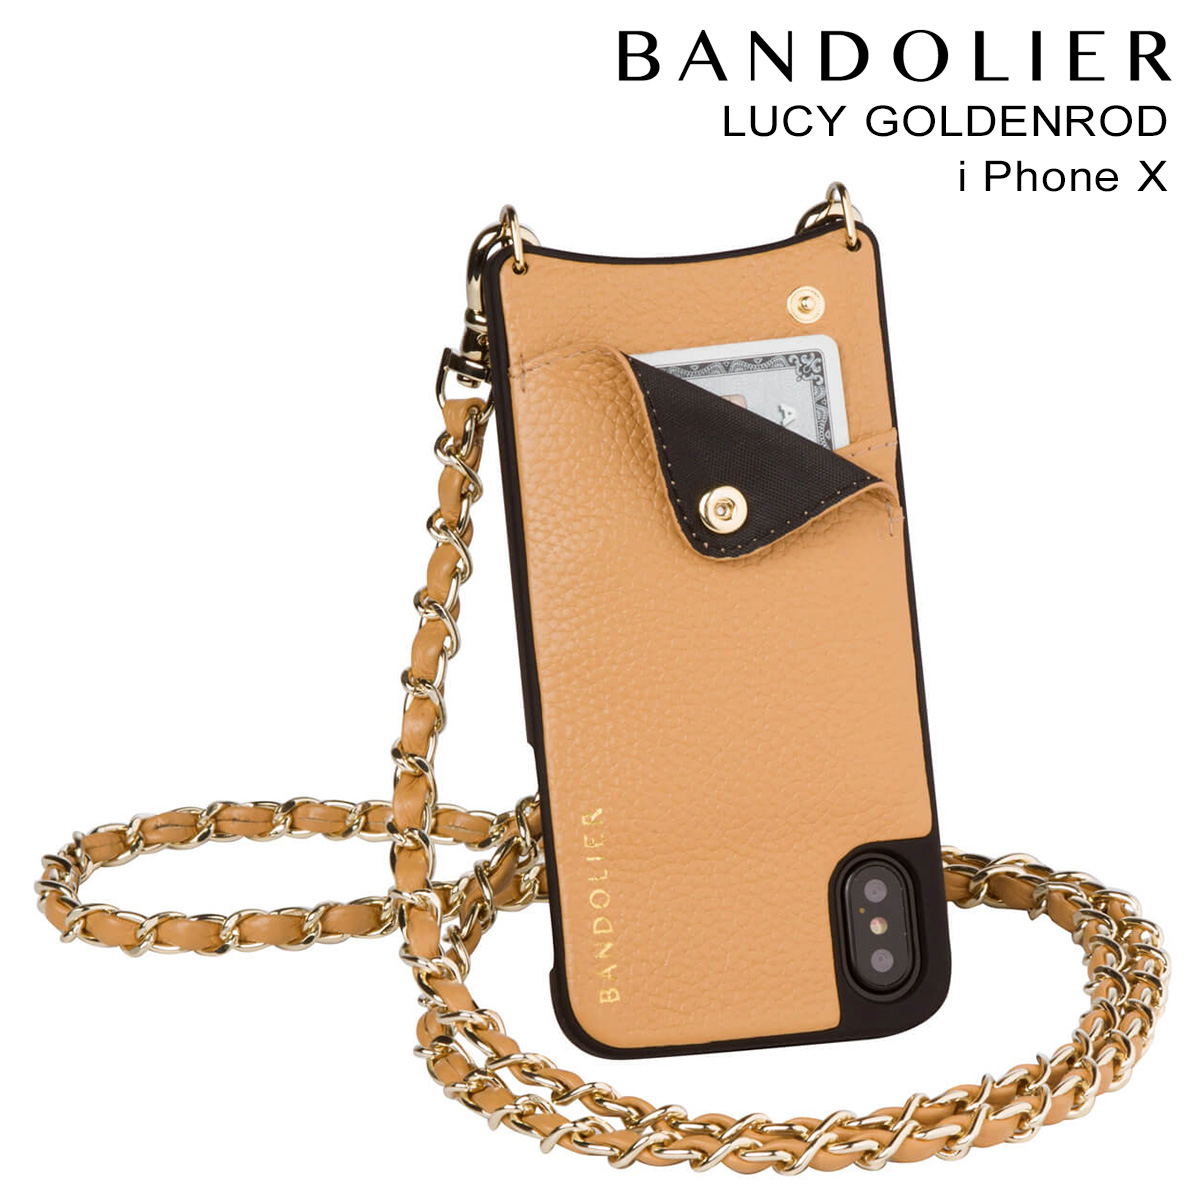 BANDOLIER iPhoneX LUCY GOLDENROD バンドリヤー ケース スマホ アイフォン レザー メンズ レディース